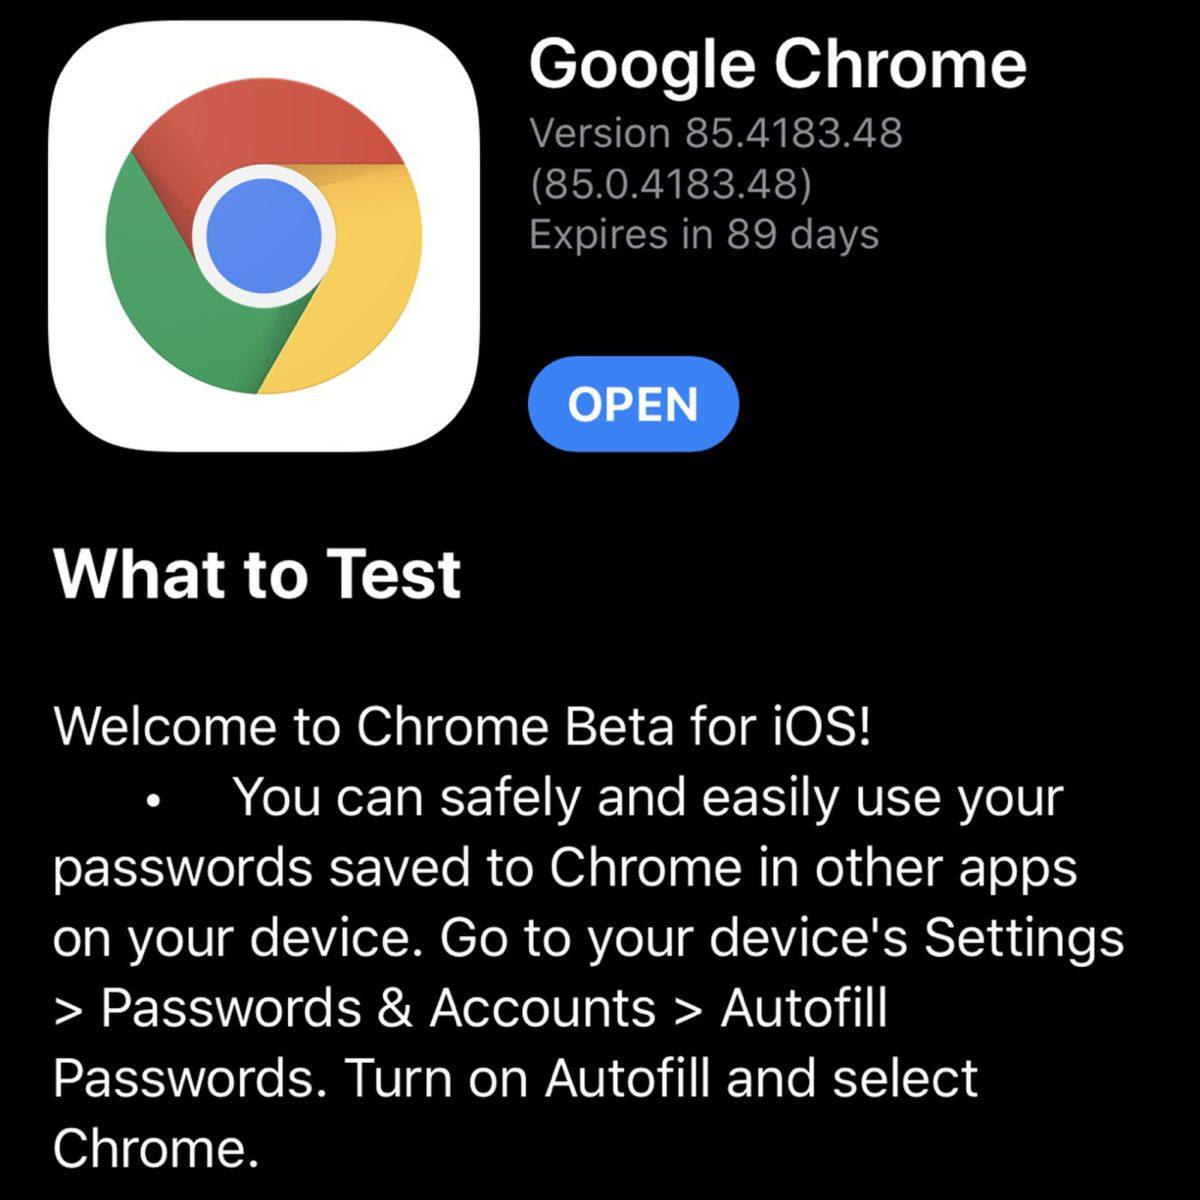 iOS 版 Google Chrome 測試密碼管理功能,為期 90 日。